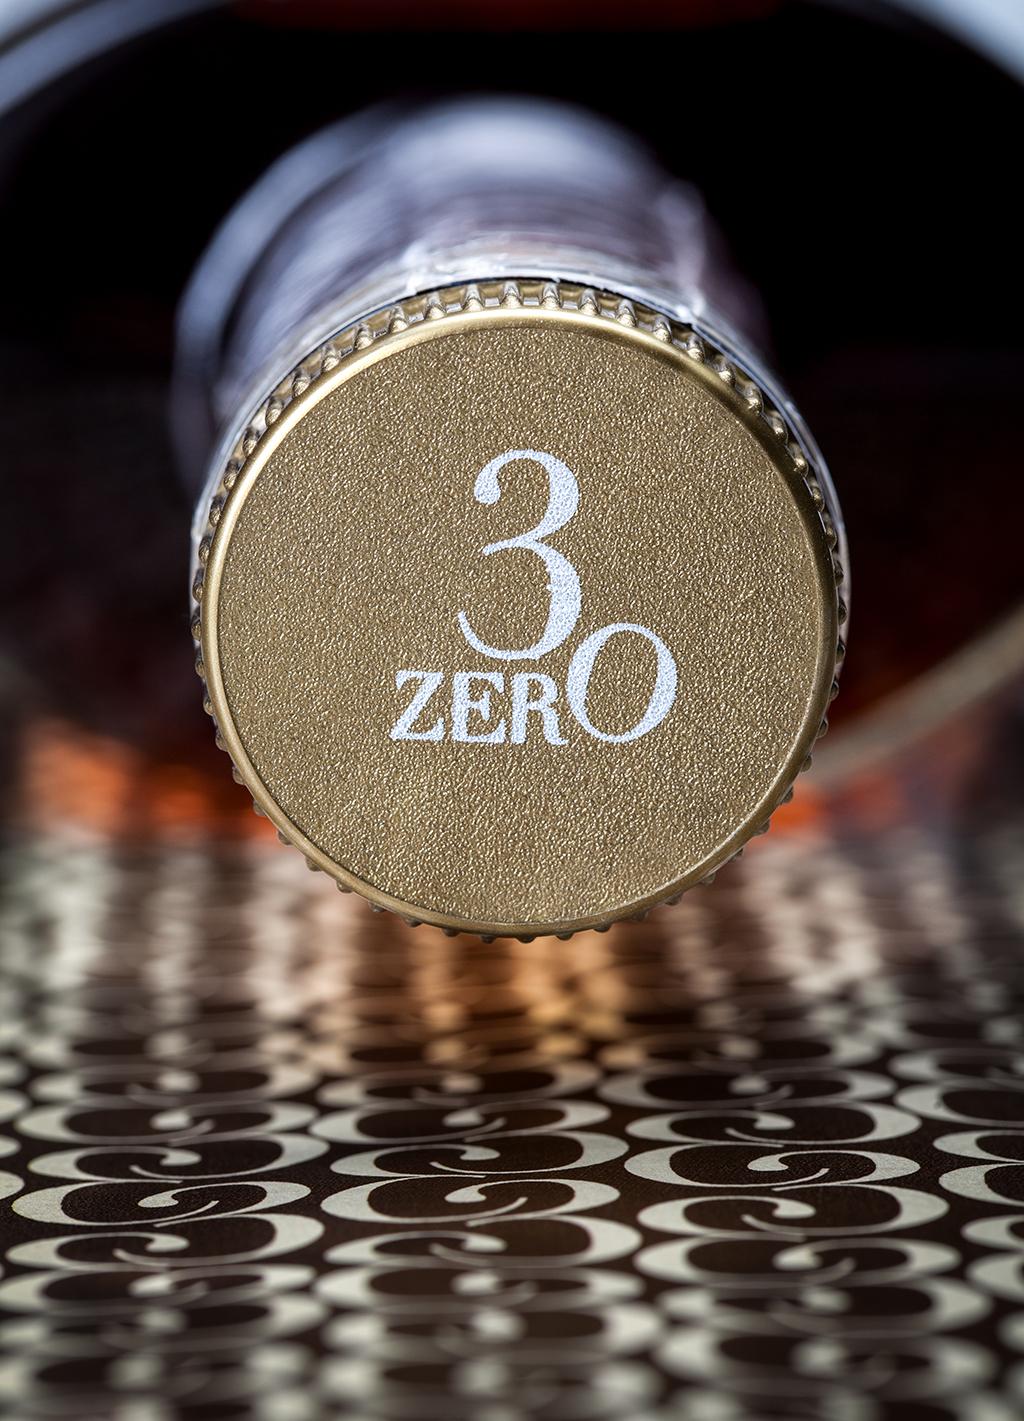 3ZERO gold_web7.jpg